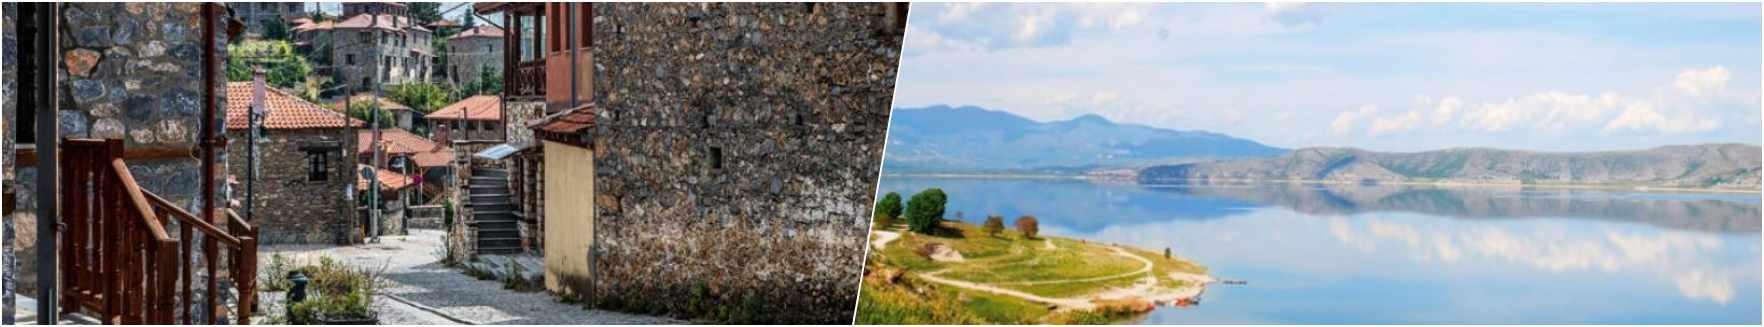 Agios Athanasios - Lake Vegoritida